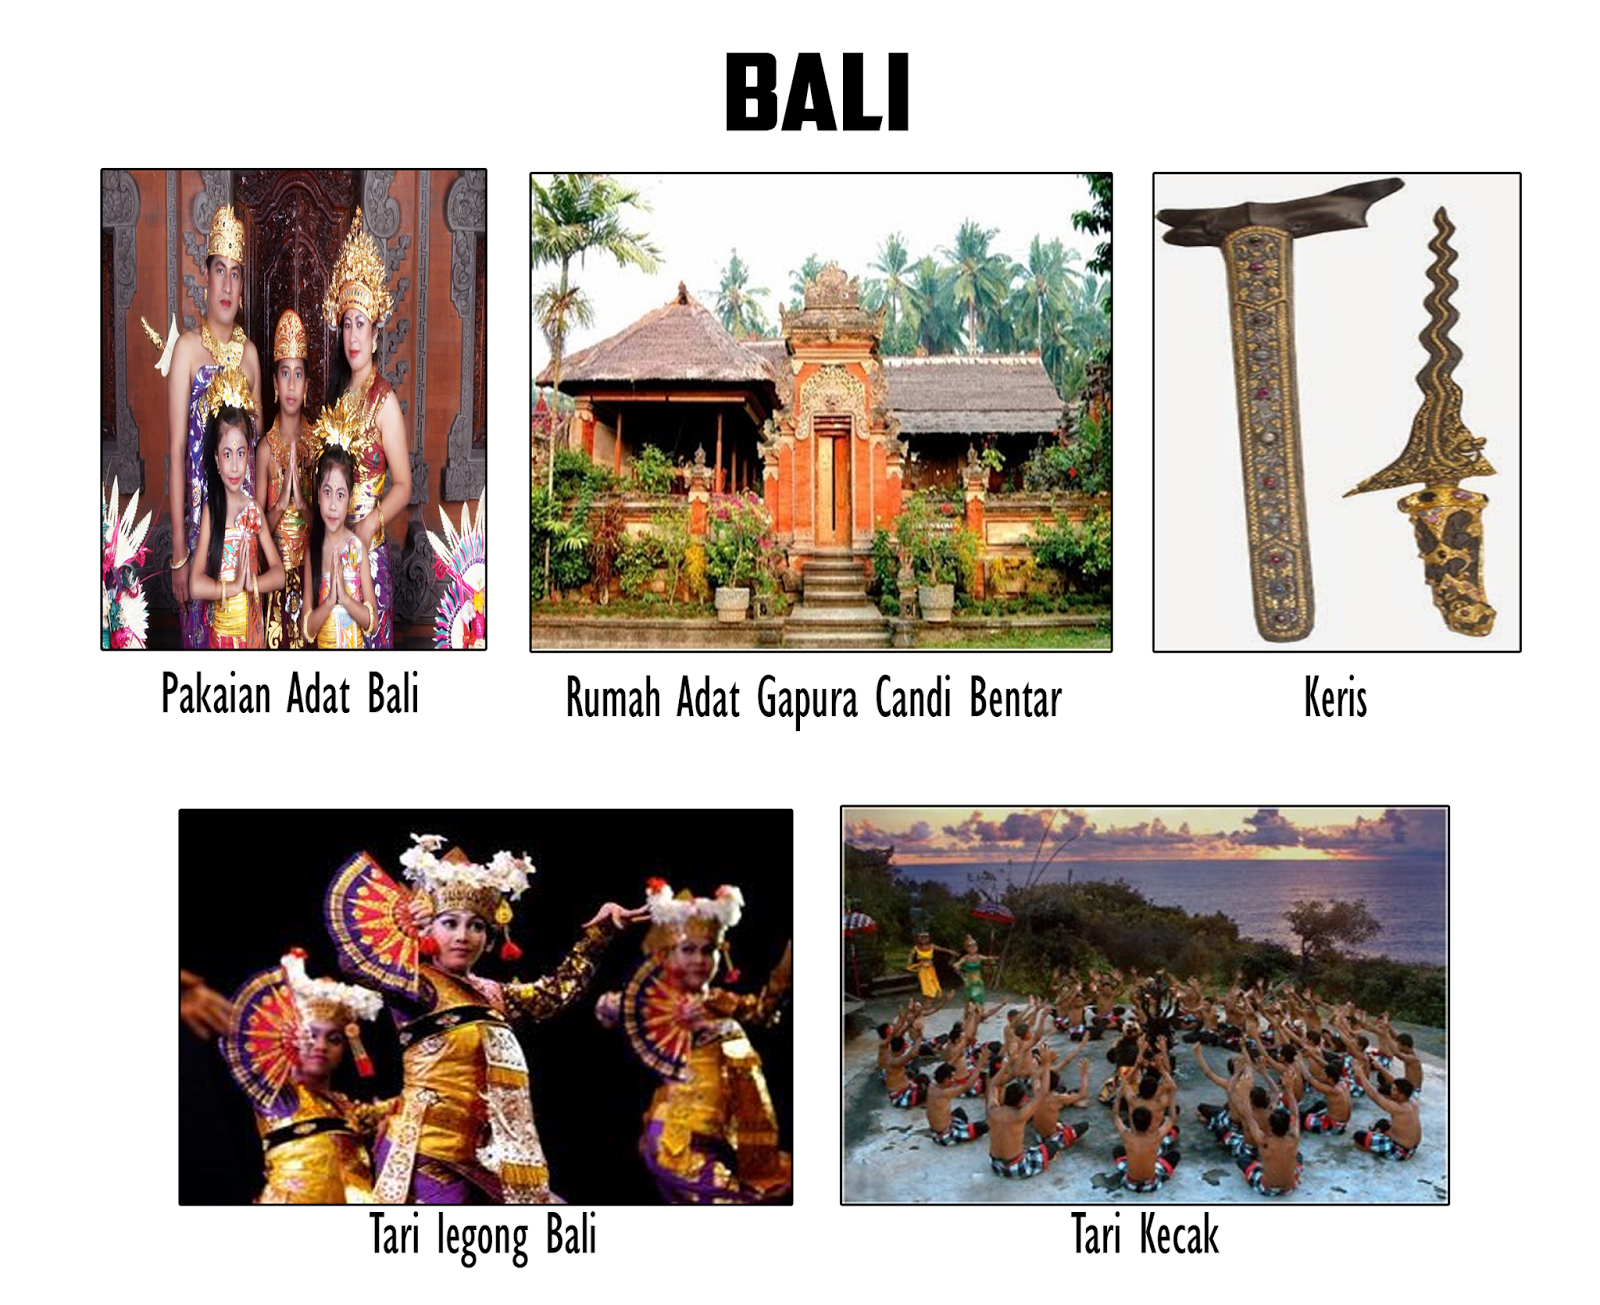 Rumah Adat Dan Pakaian Adat Bali gambar gambar sketsa adat bali gapura candi bentar mewarnai